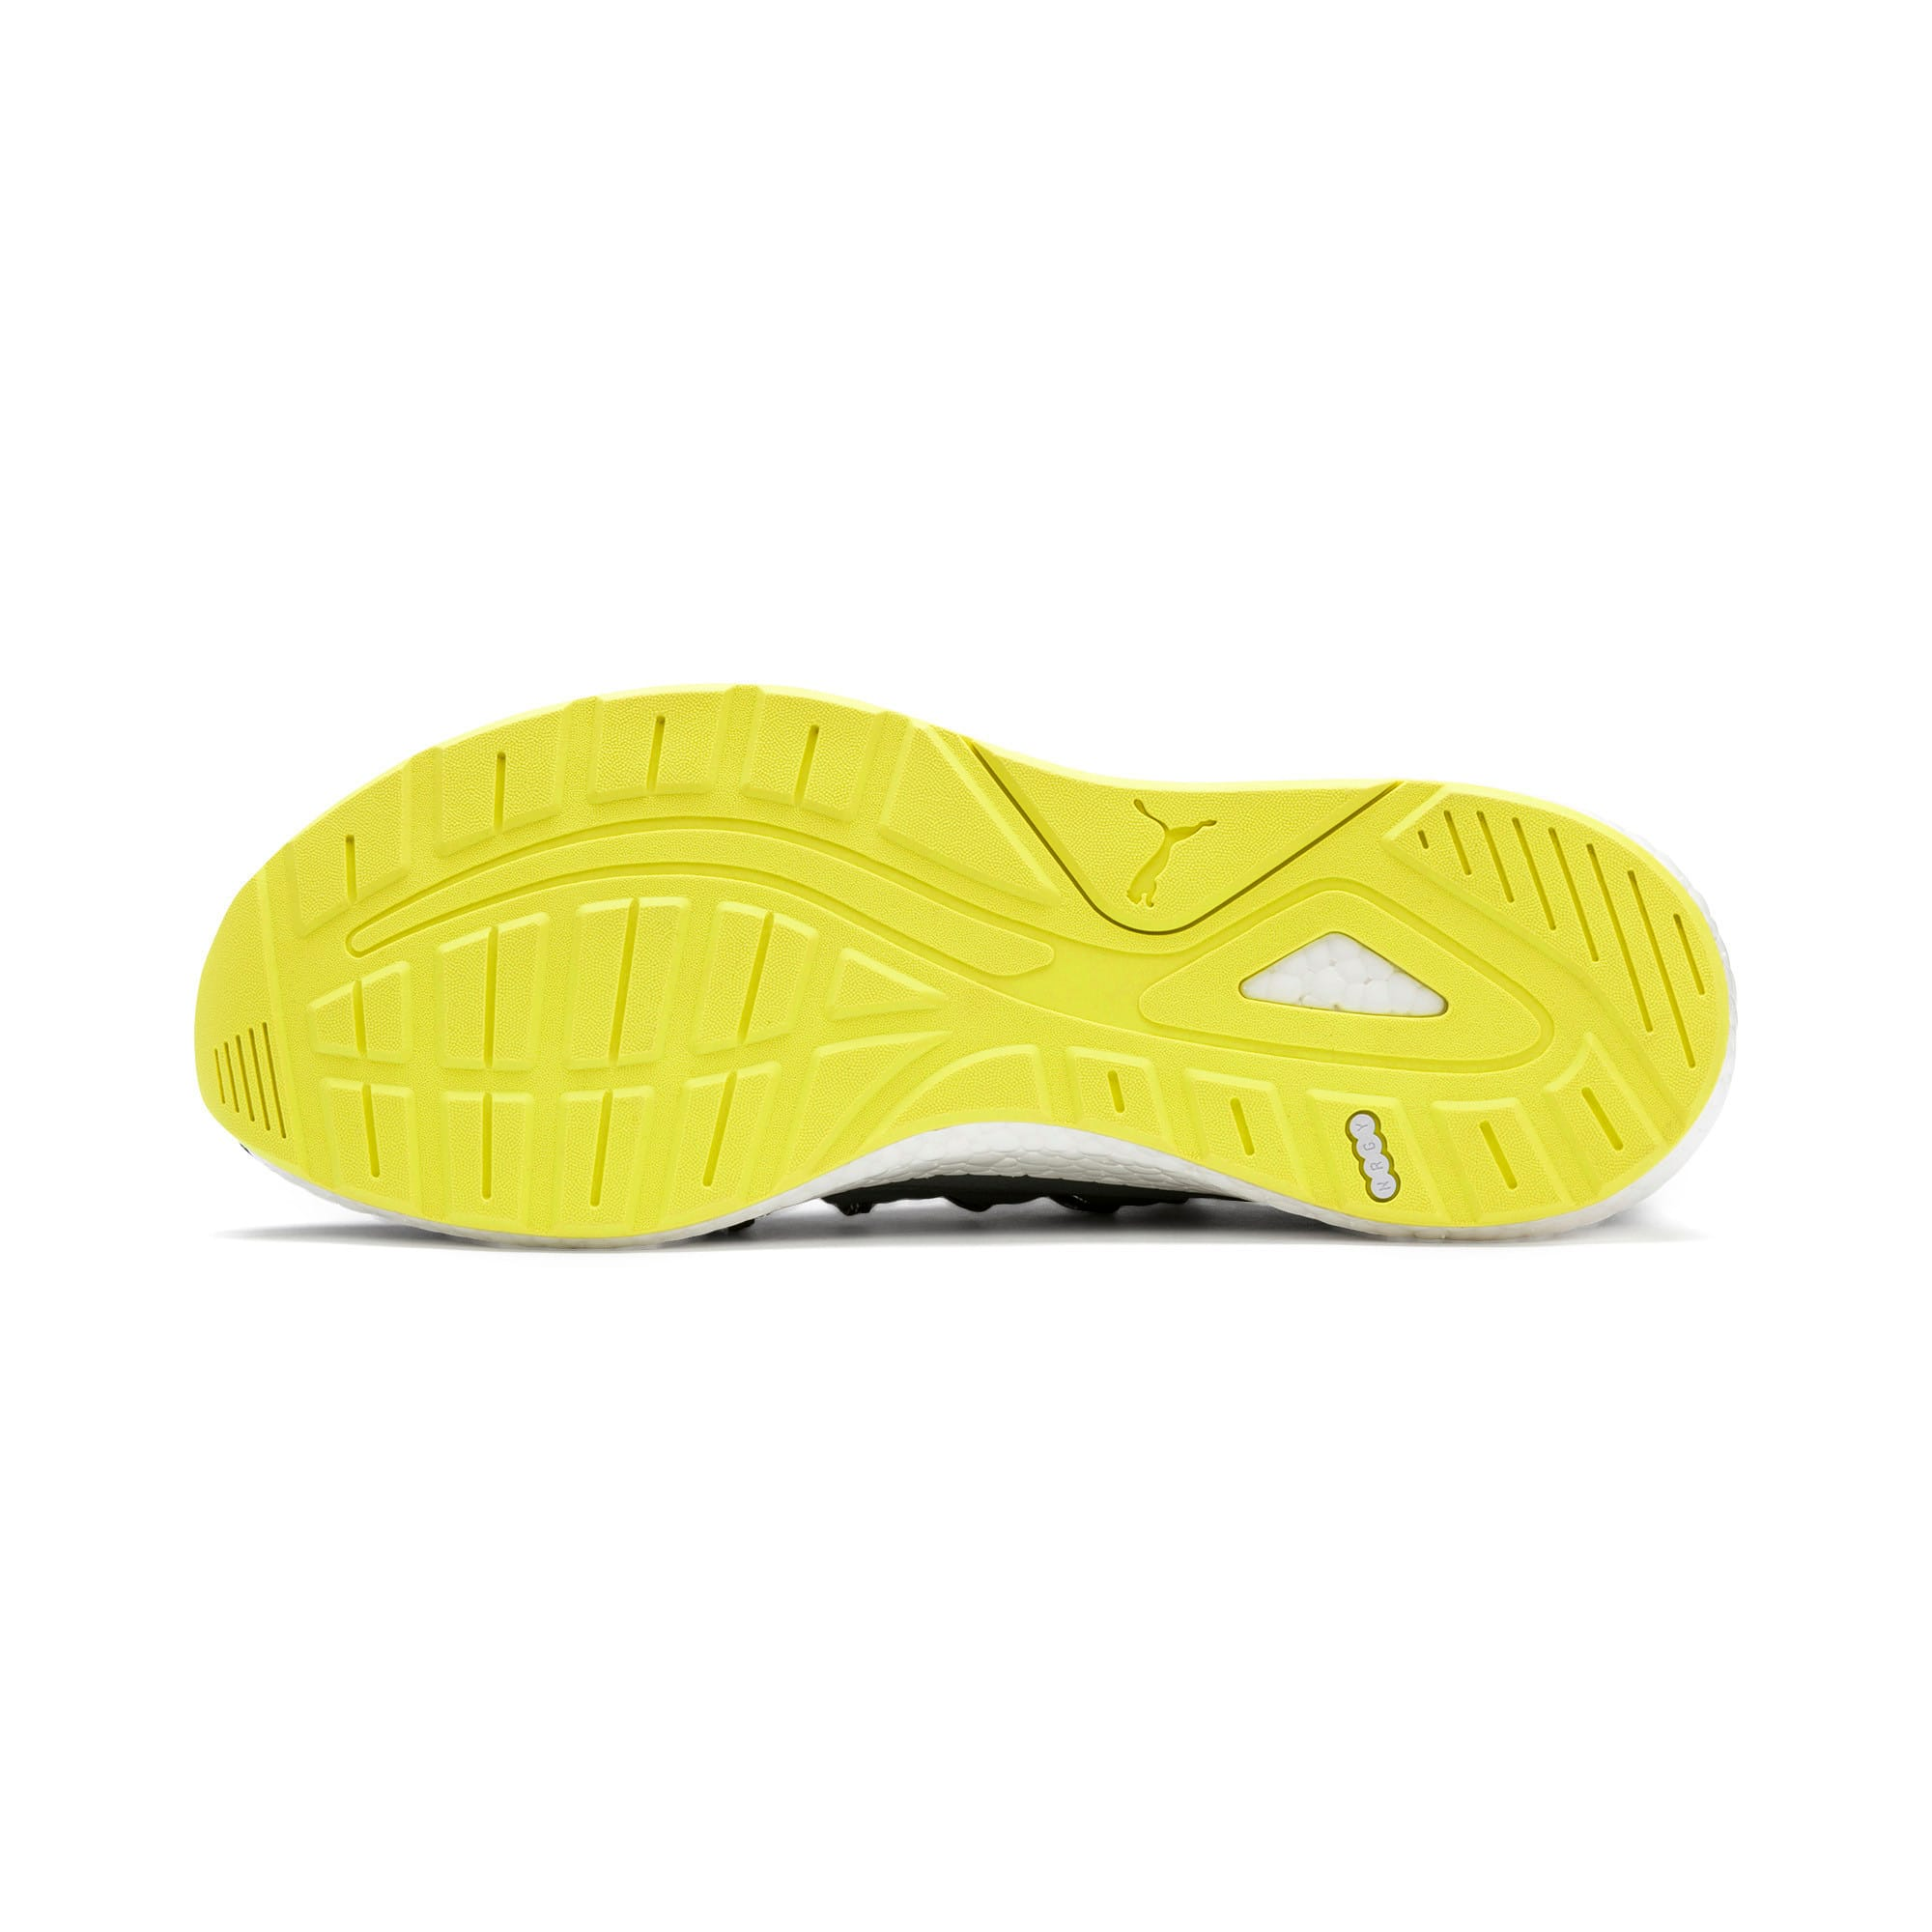 Thumbnail 7 of NRGY Neko Lights Men's Running Shoes, CASTLEROCK-Yellow Alert, medium-IND